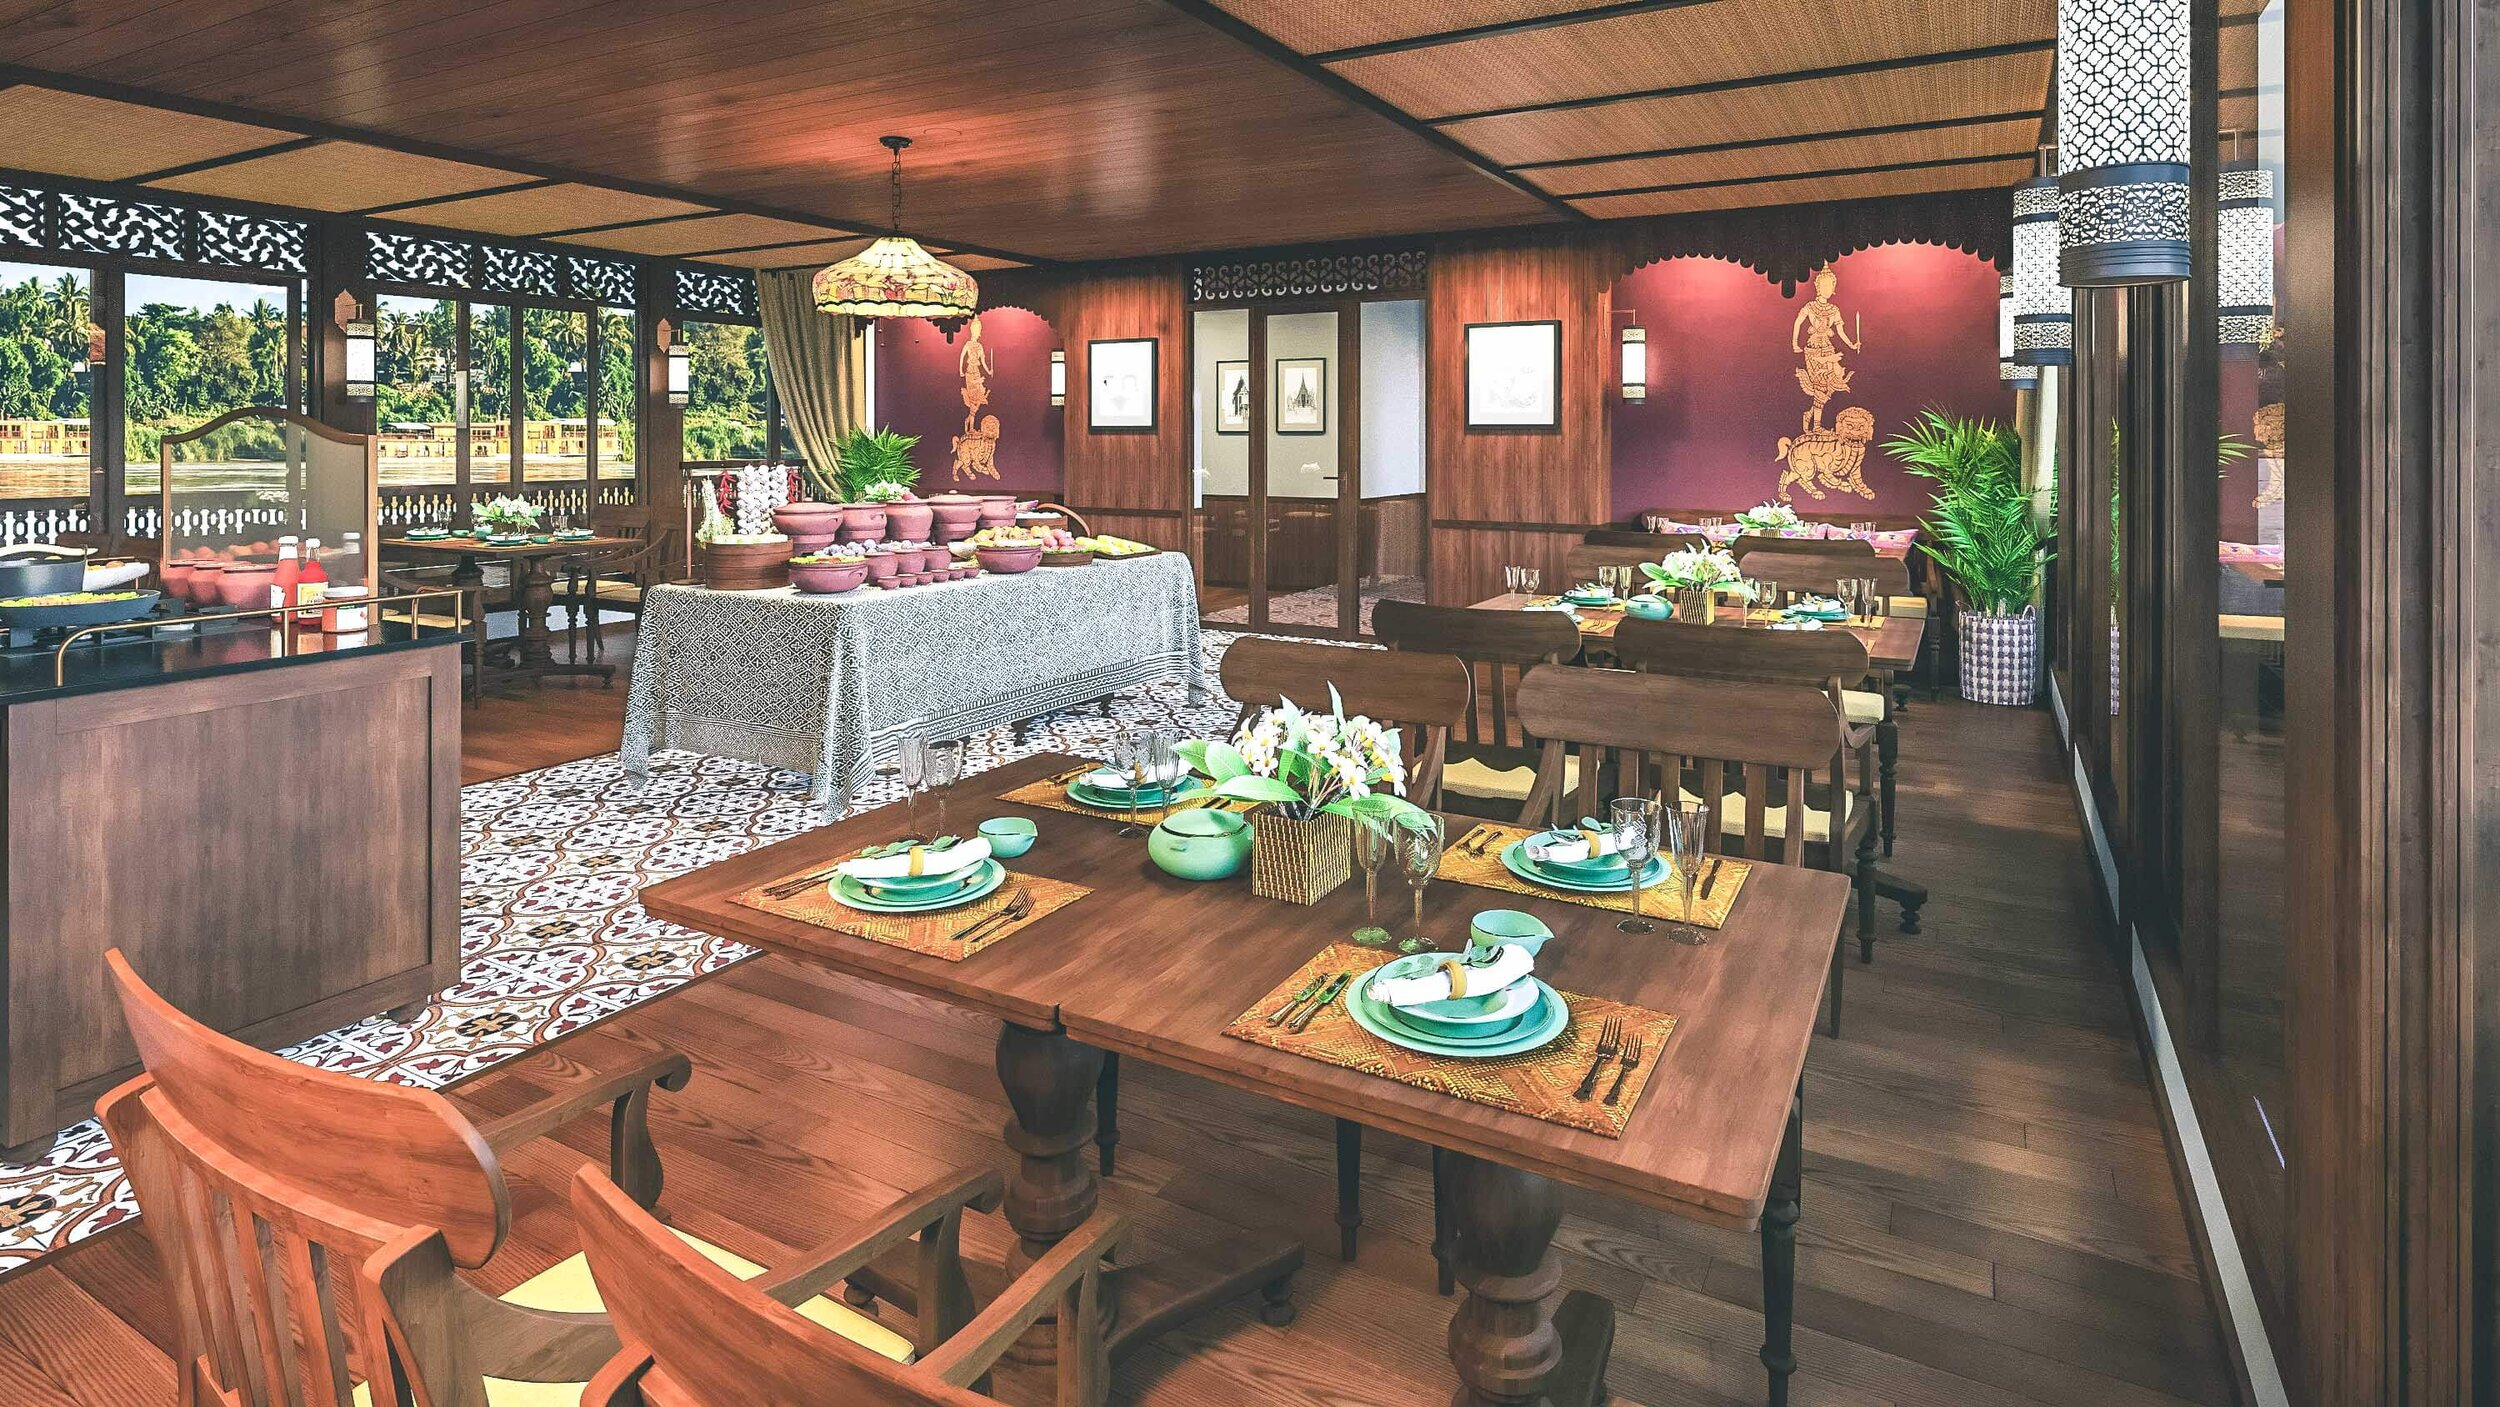 Heritage Line - Upper Mekong - Anouvong - De Lagree Dining Hall 1 - LR.jpg